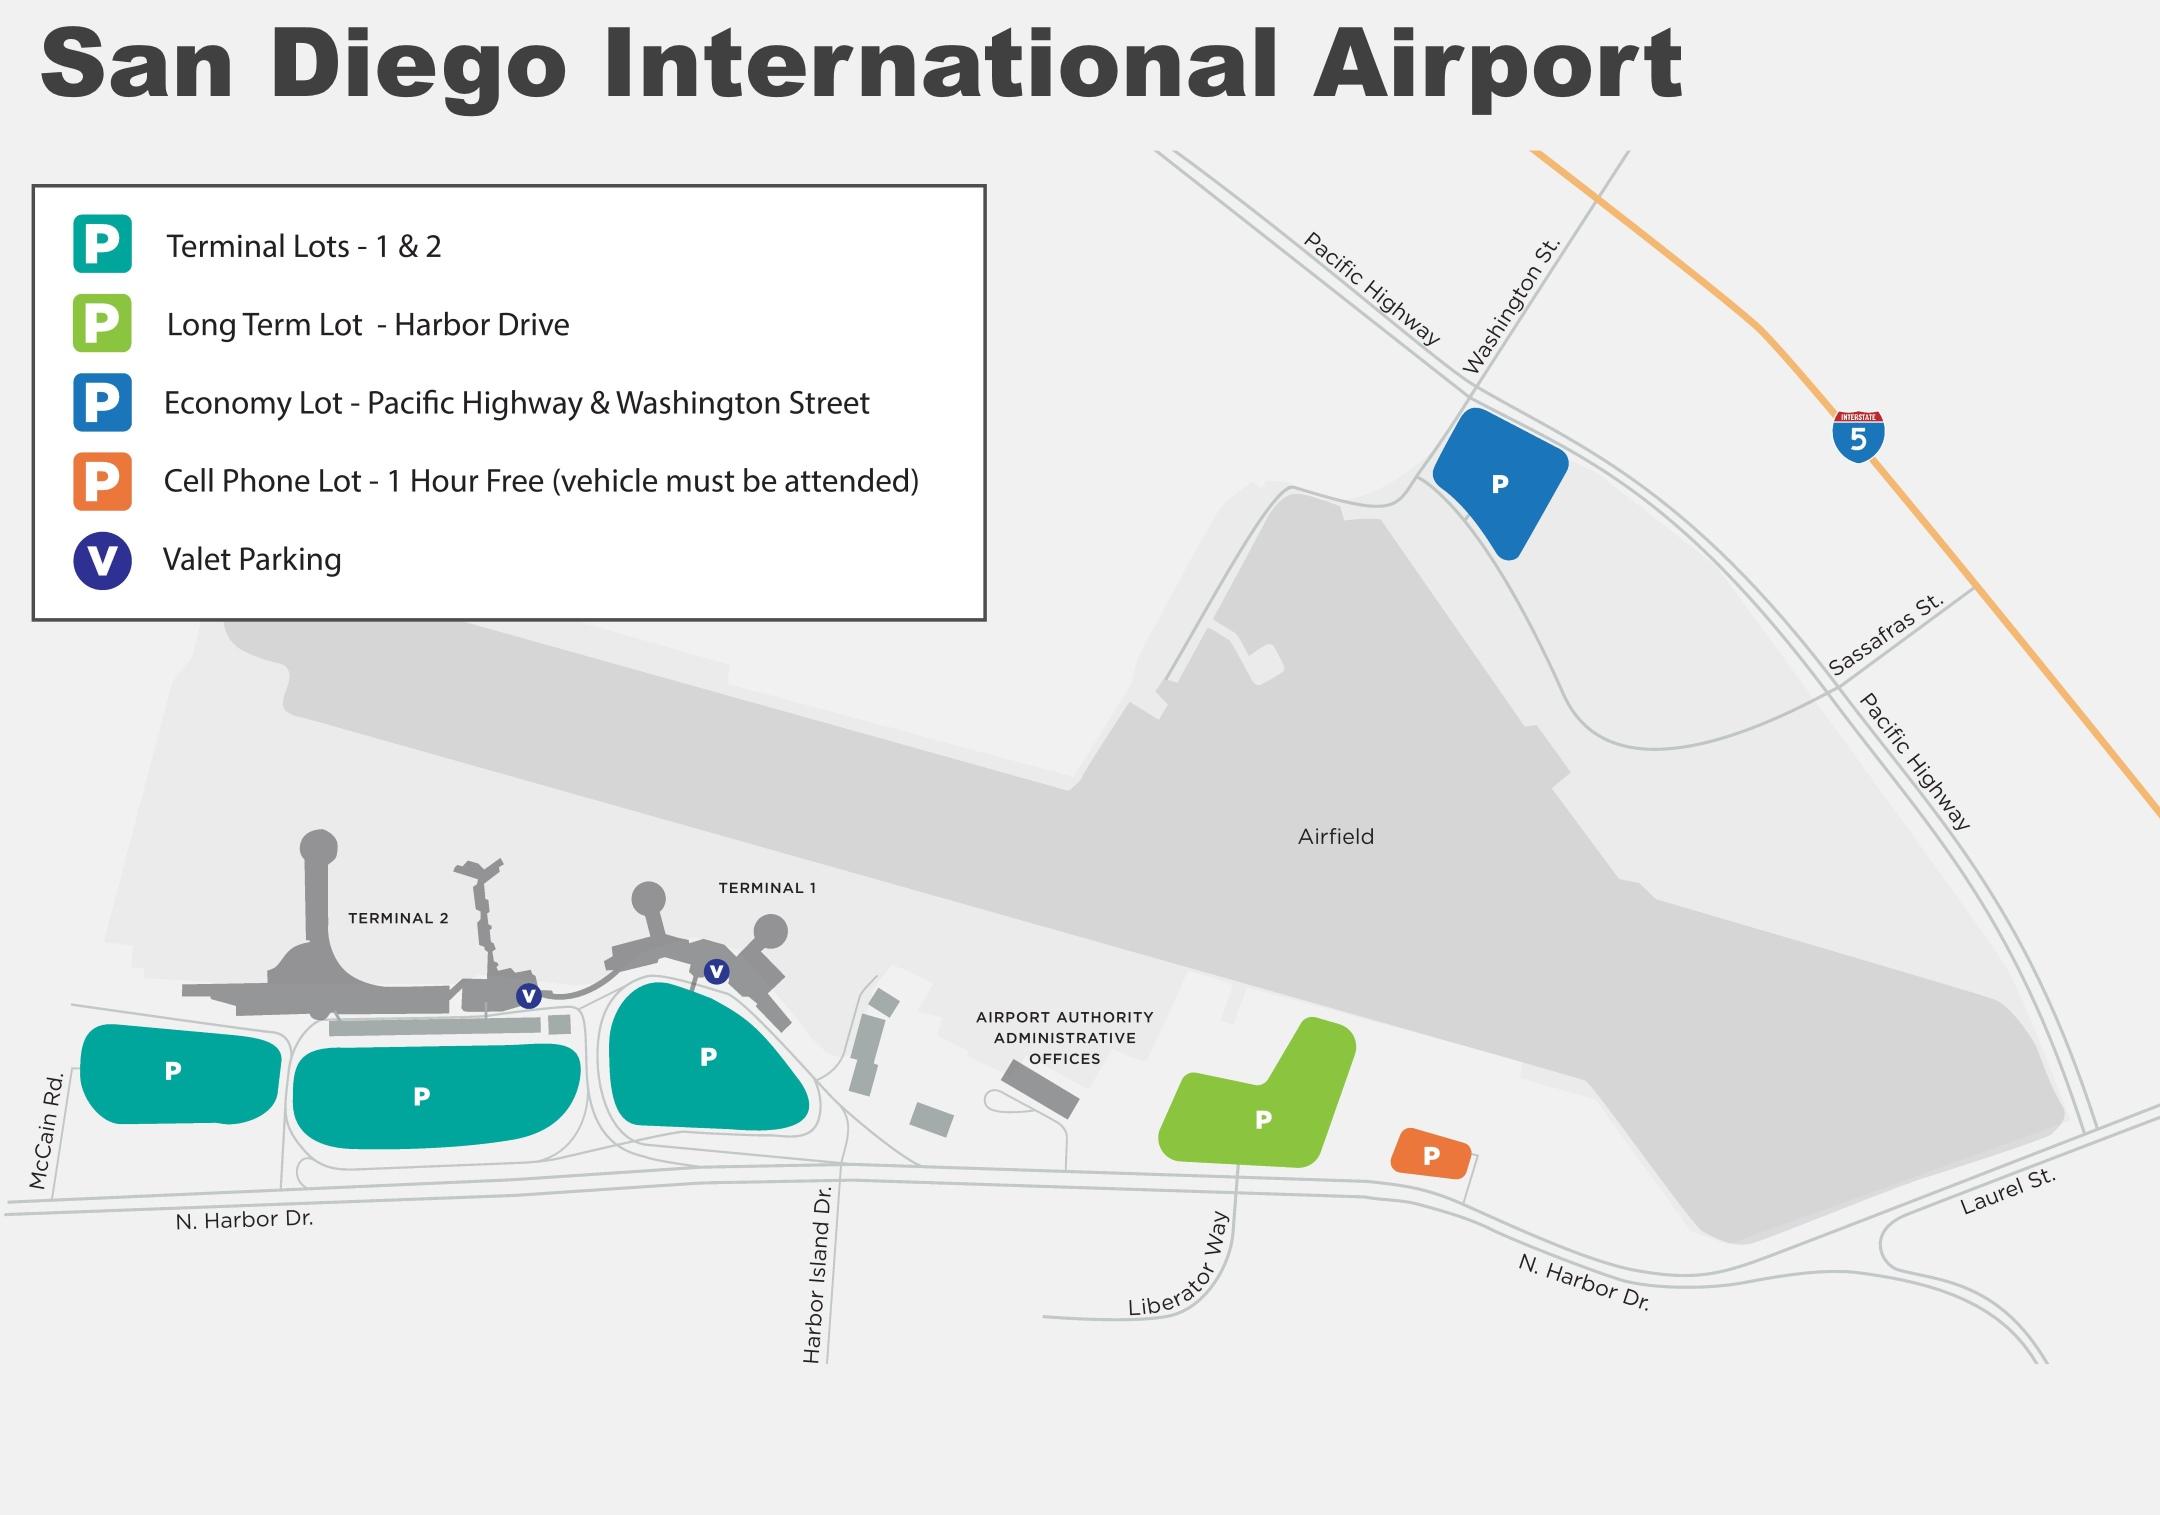 San Diego International Airport Map San Diego International Airport map